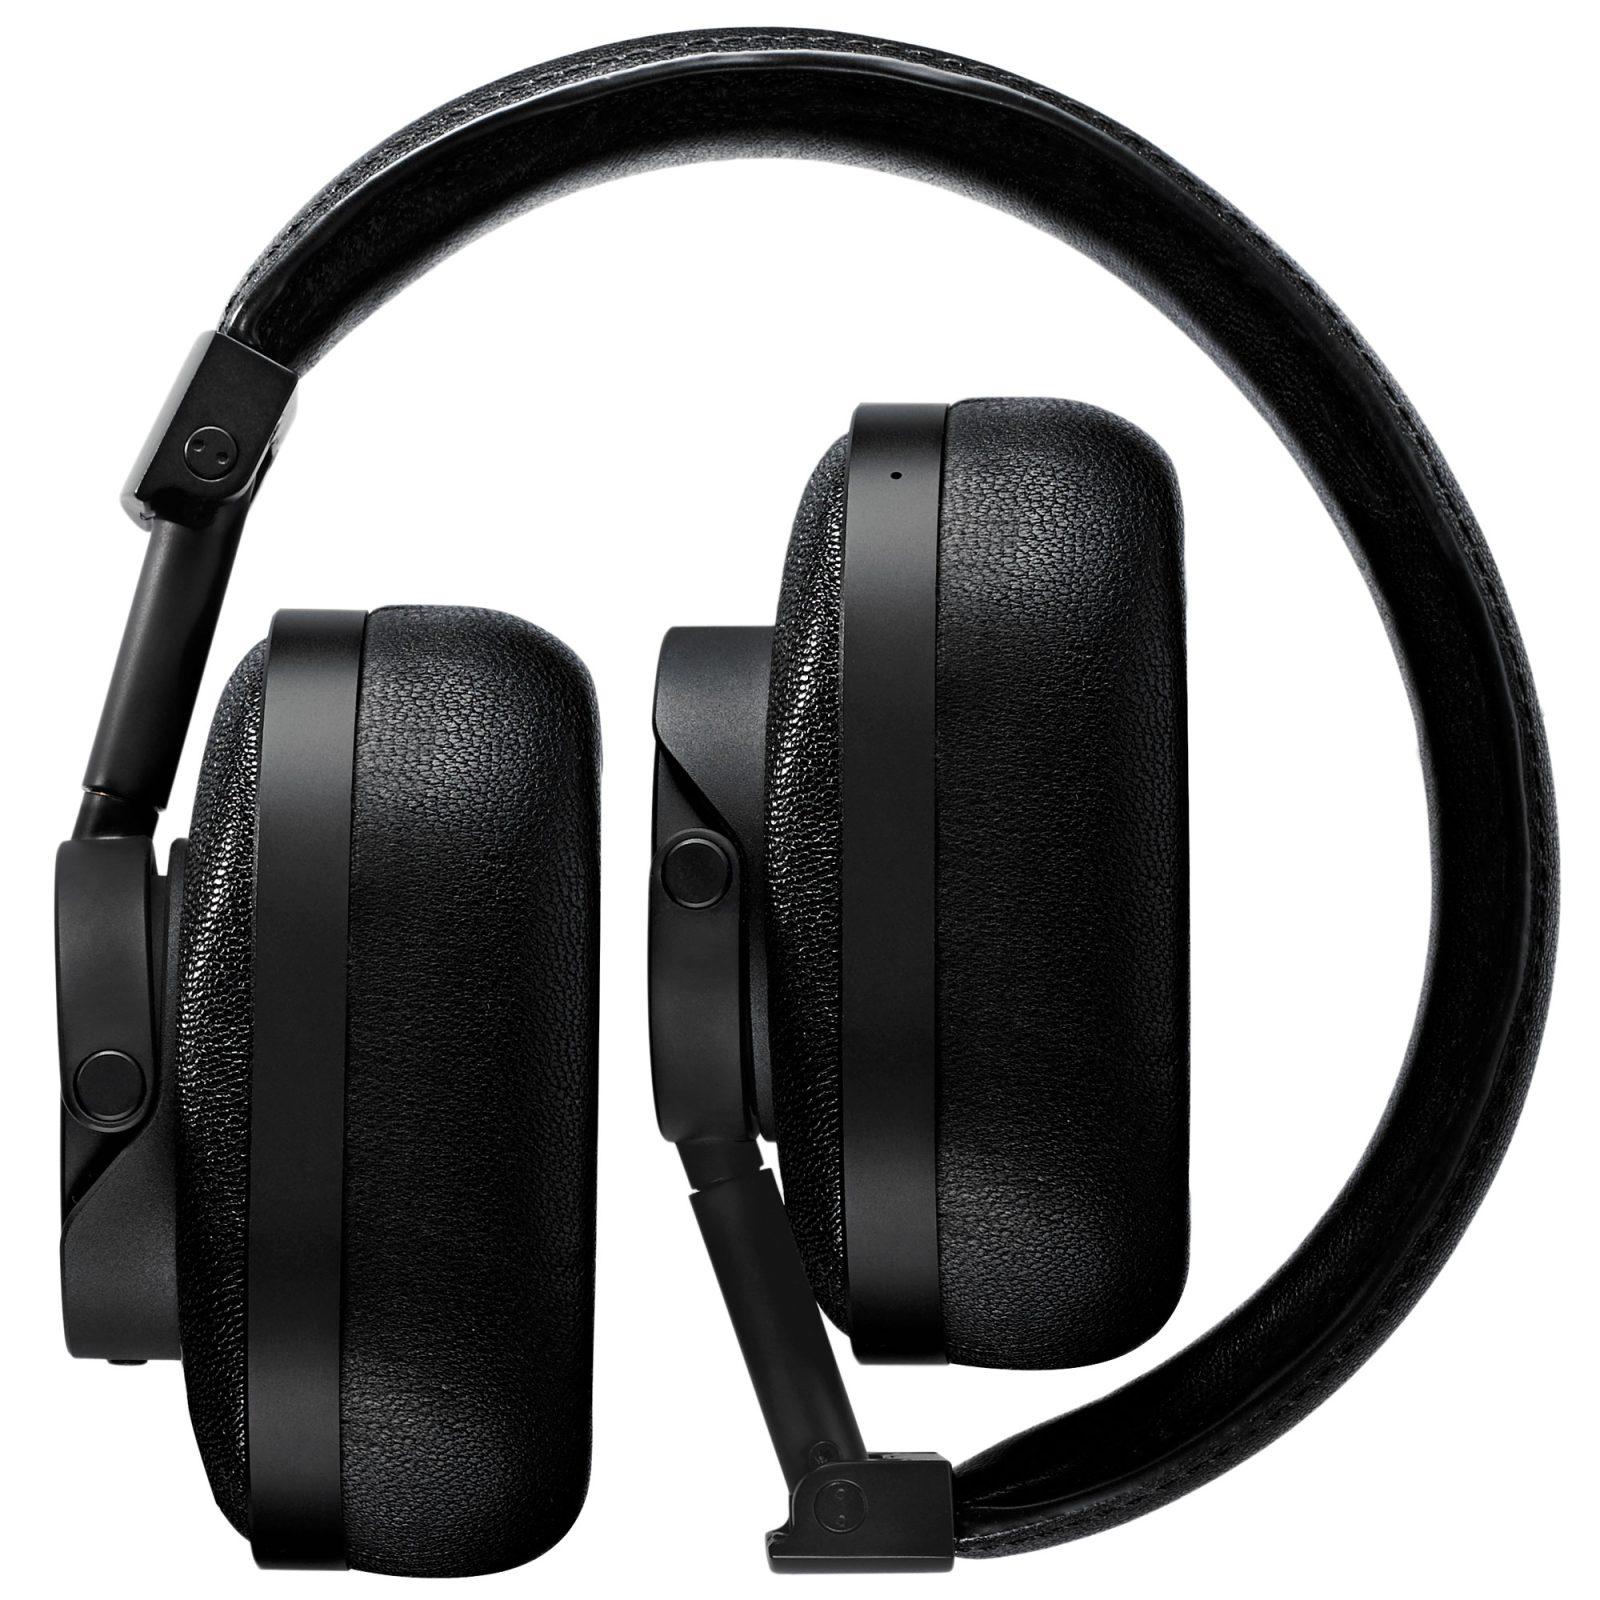 mw60-wireless-over-ear-headphones-black-black-6